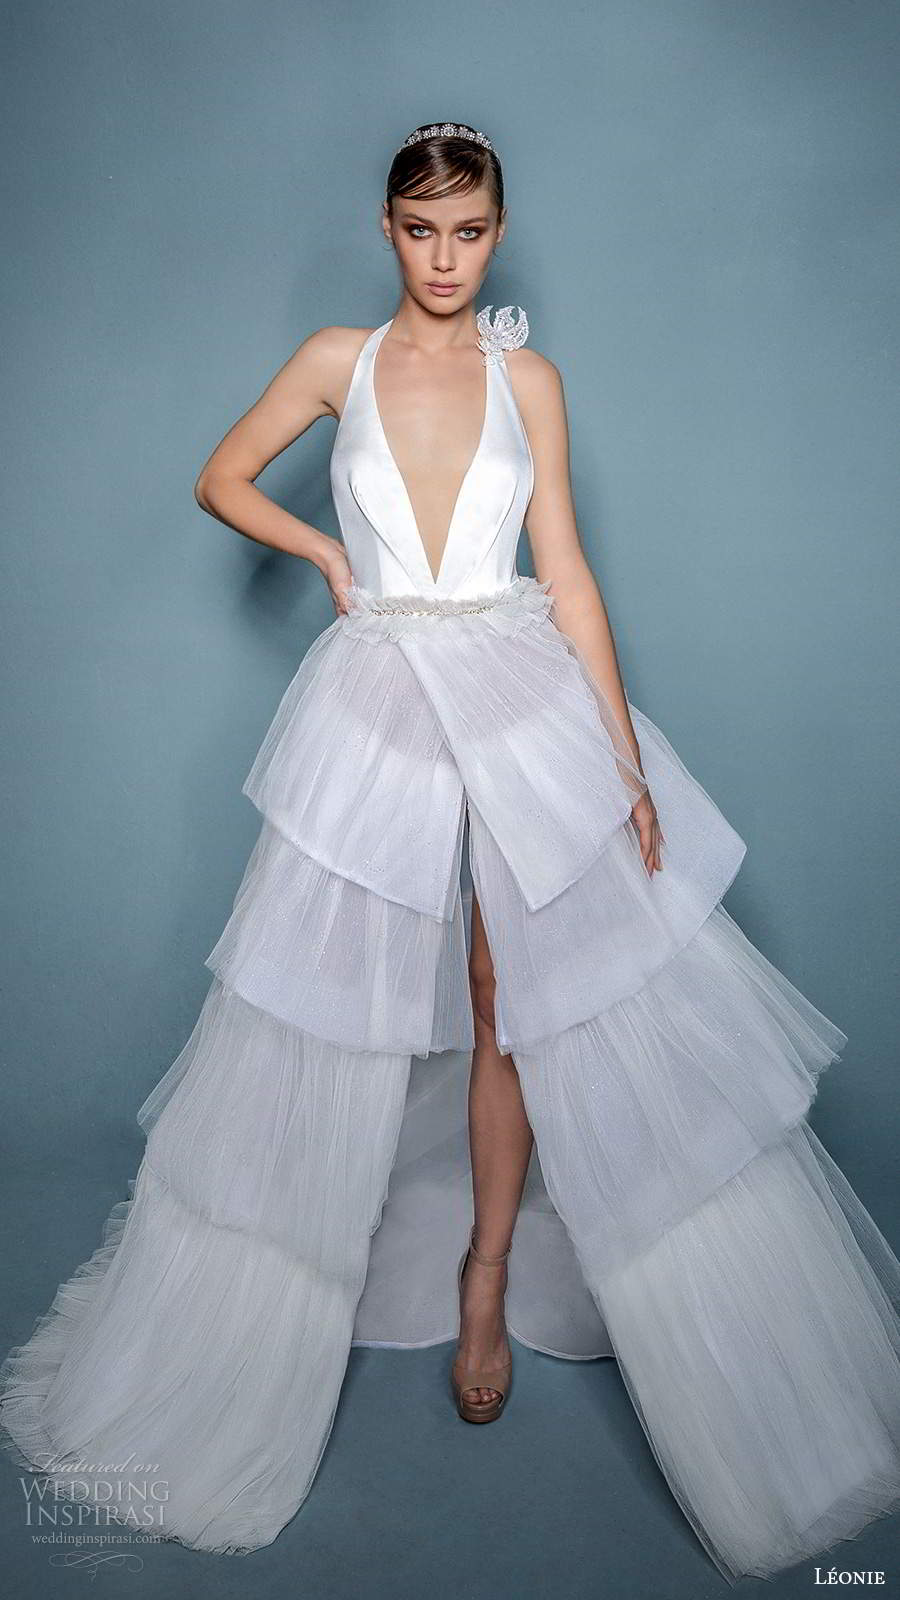 leonie bridal 2020 bridal sleeveless halter straps plunging v necklinen a line ball gown wedding dress slit skirt (10) mv